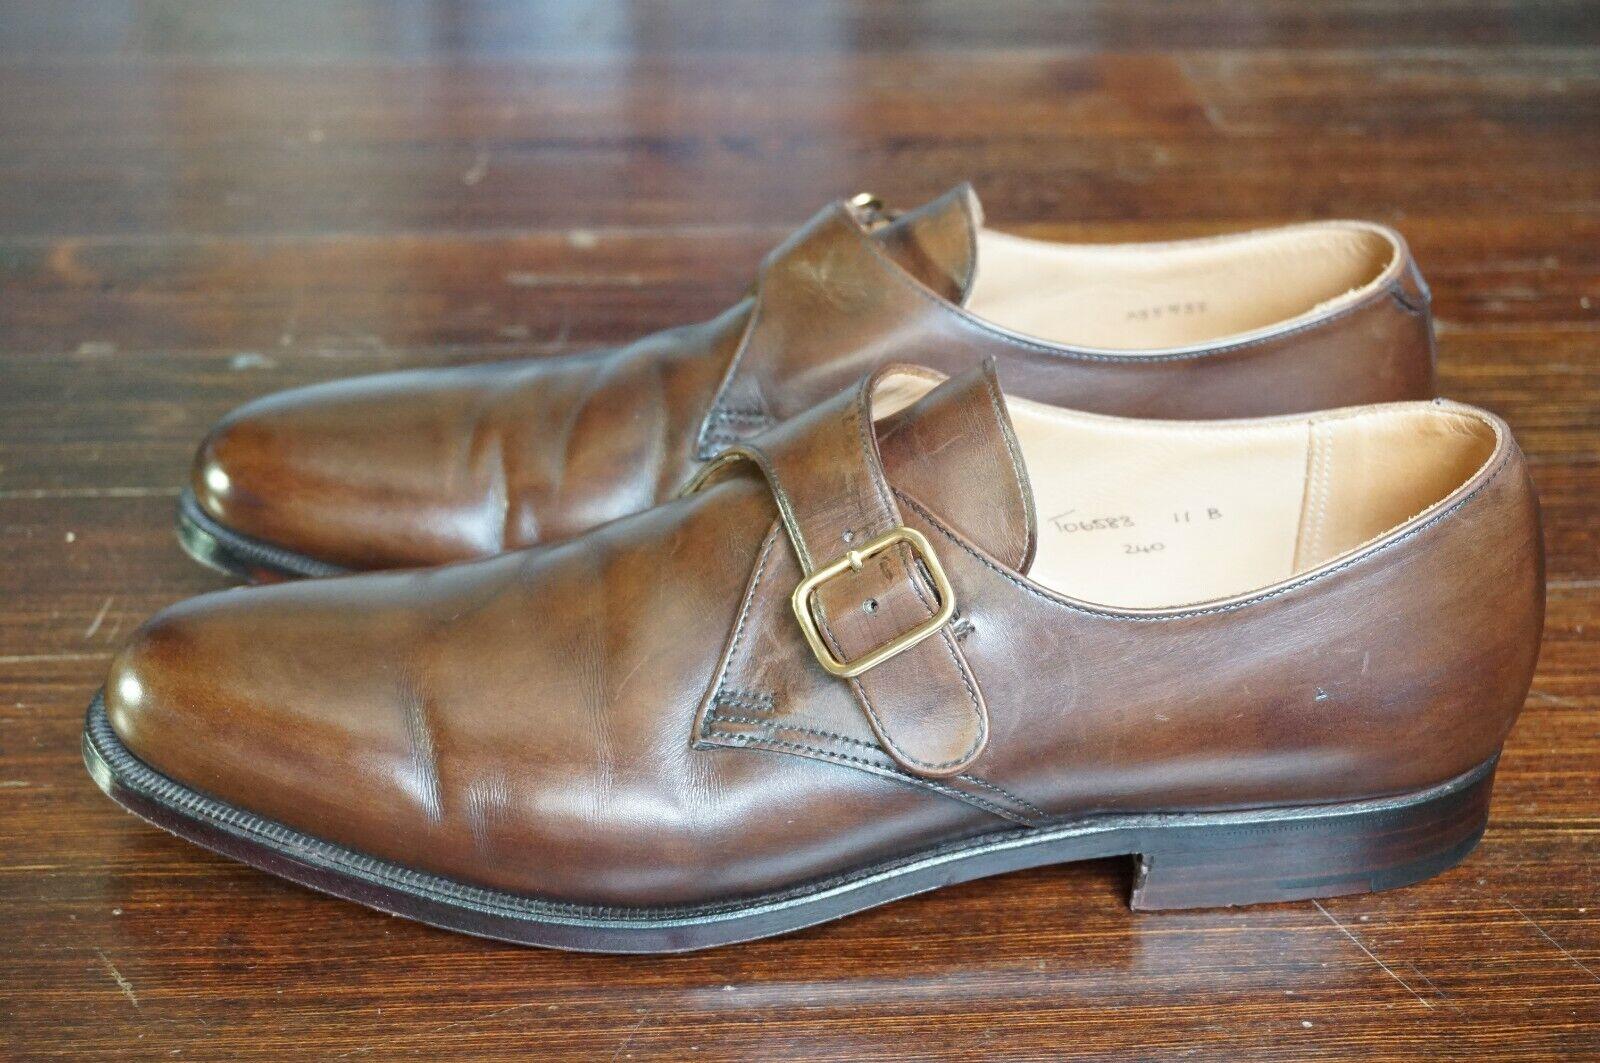 660 CROCKETT & JONES Monkton US 11 B UK 10 Monk Strap marron handgrade